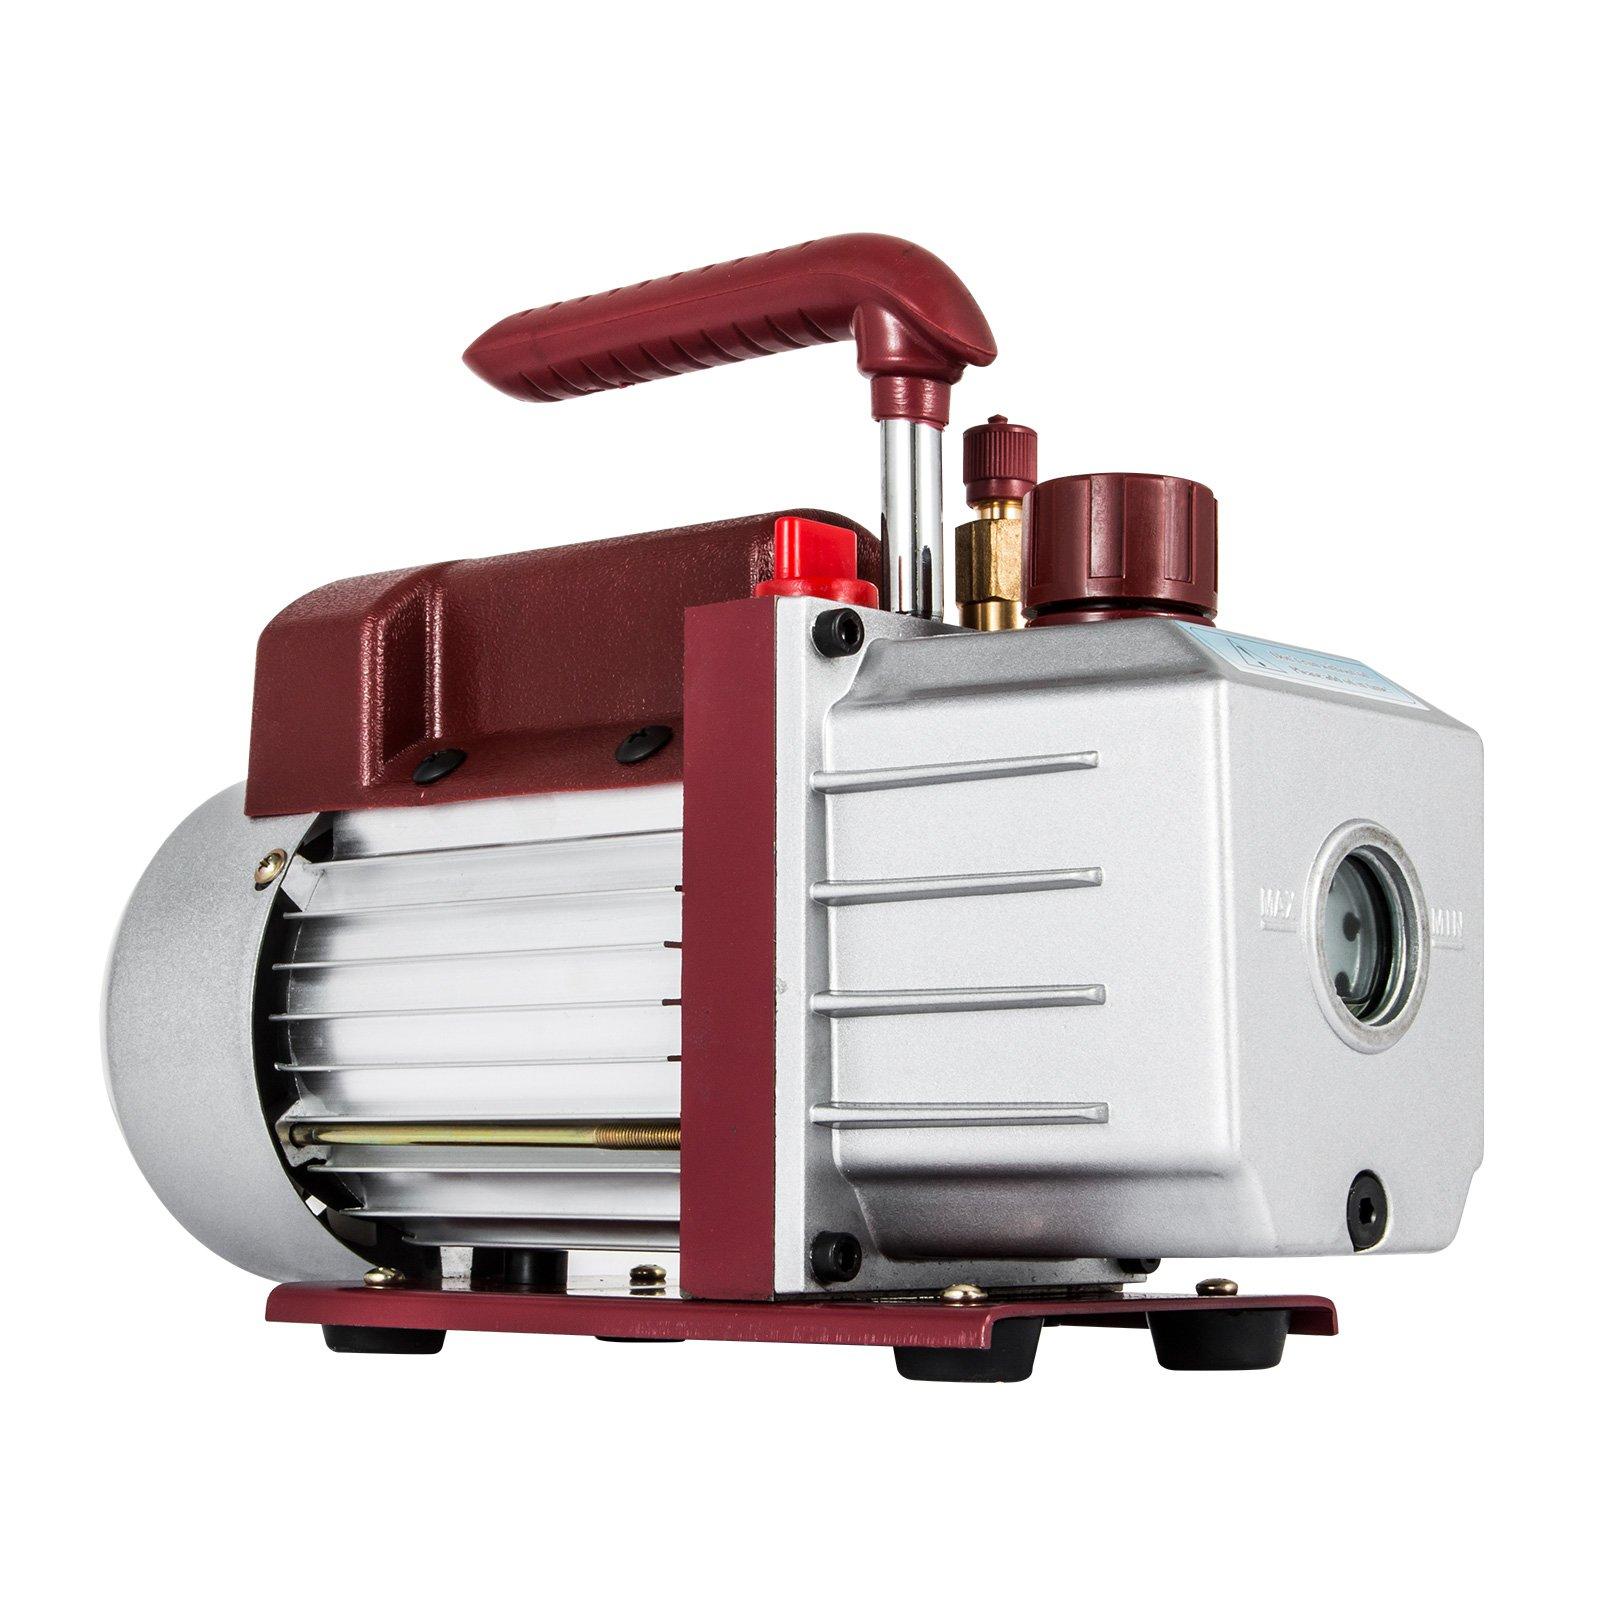 Bestauto 4.5CFM 1/3HP Vacuum Pump 110V 2 Meter Valve 1 Stage 5PA Ultimate Air Conditioning Refrigerant Vacuum Pump for HVAC/Auto AC Refrigerant Recharging Degassing wine epoxy Milking (4.5CFM 1-Stage)